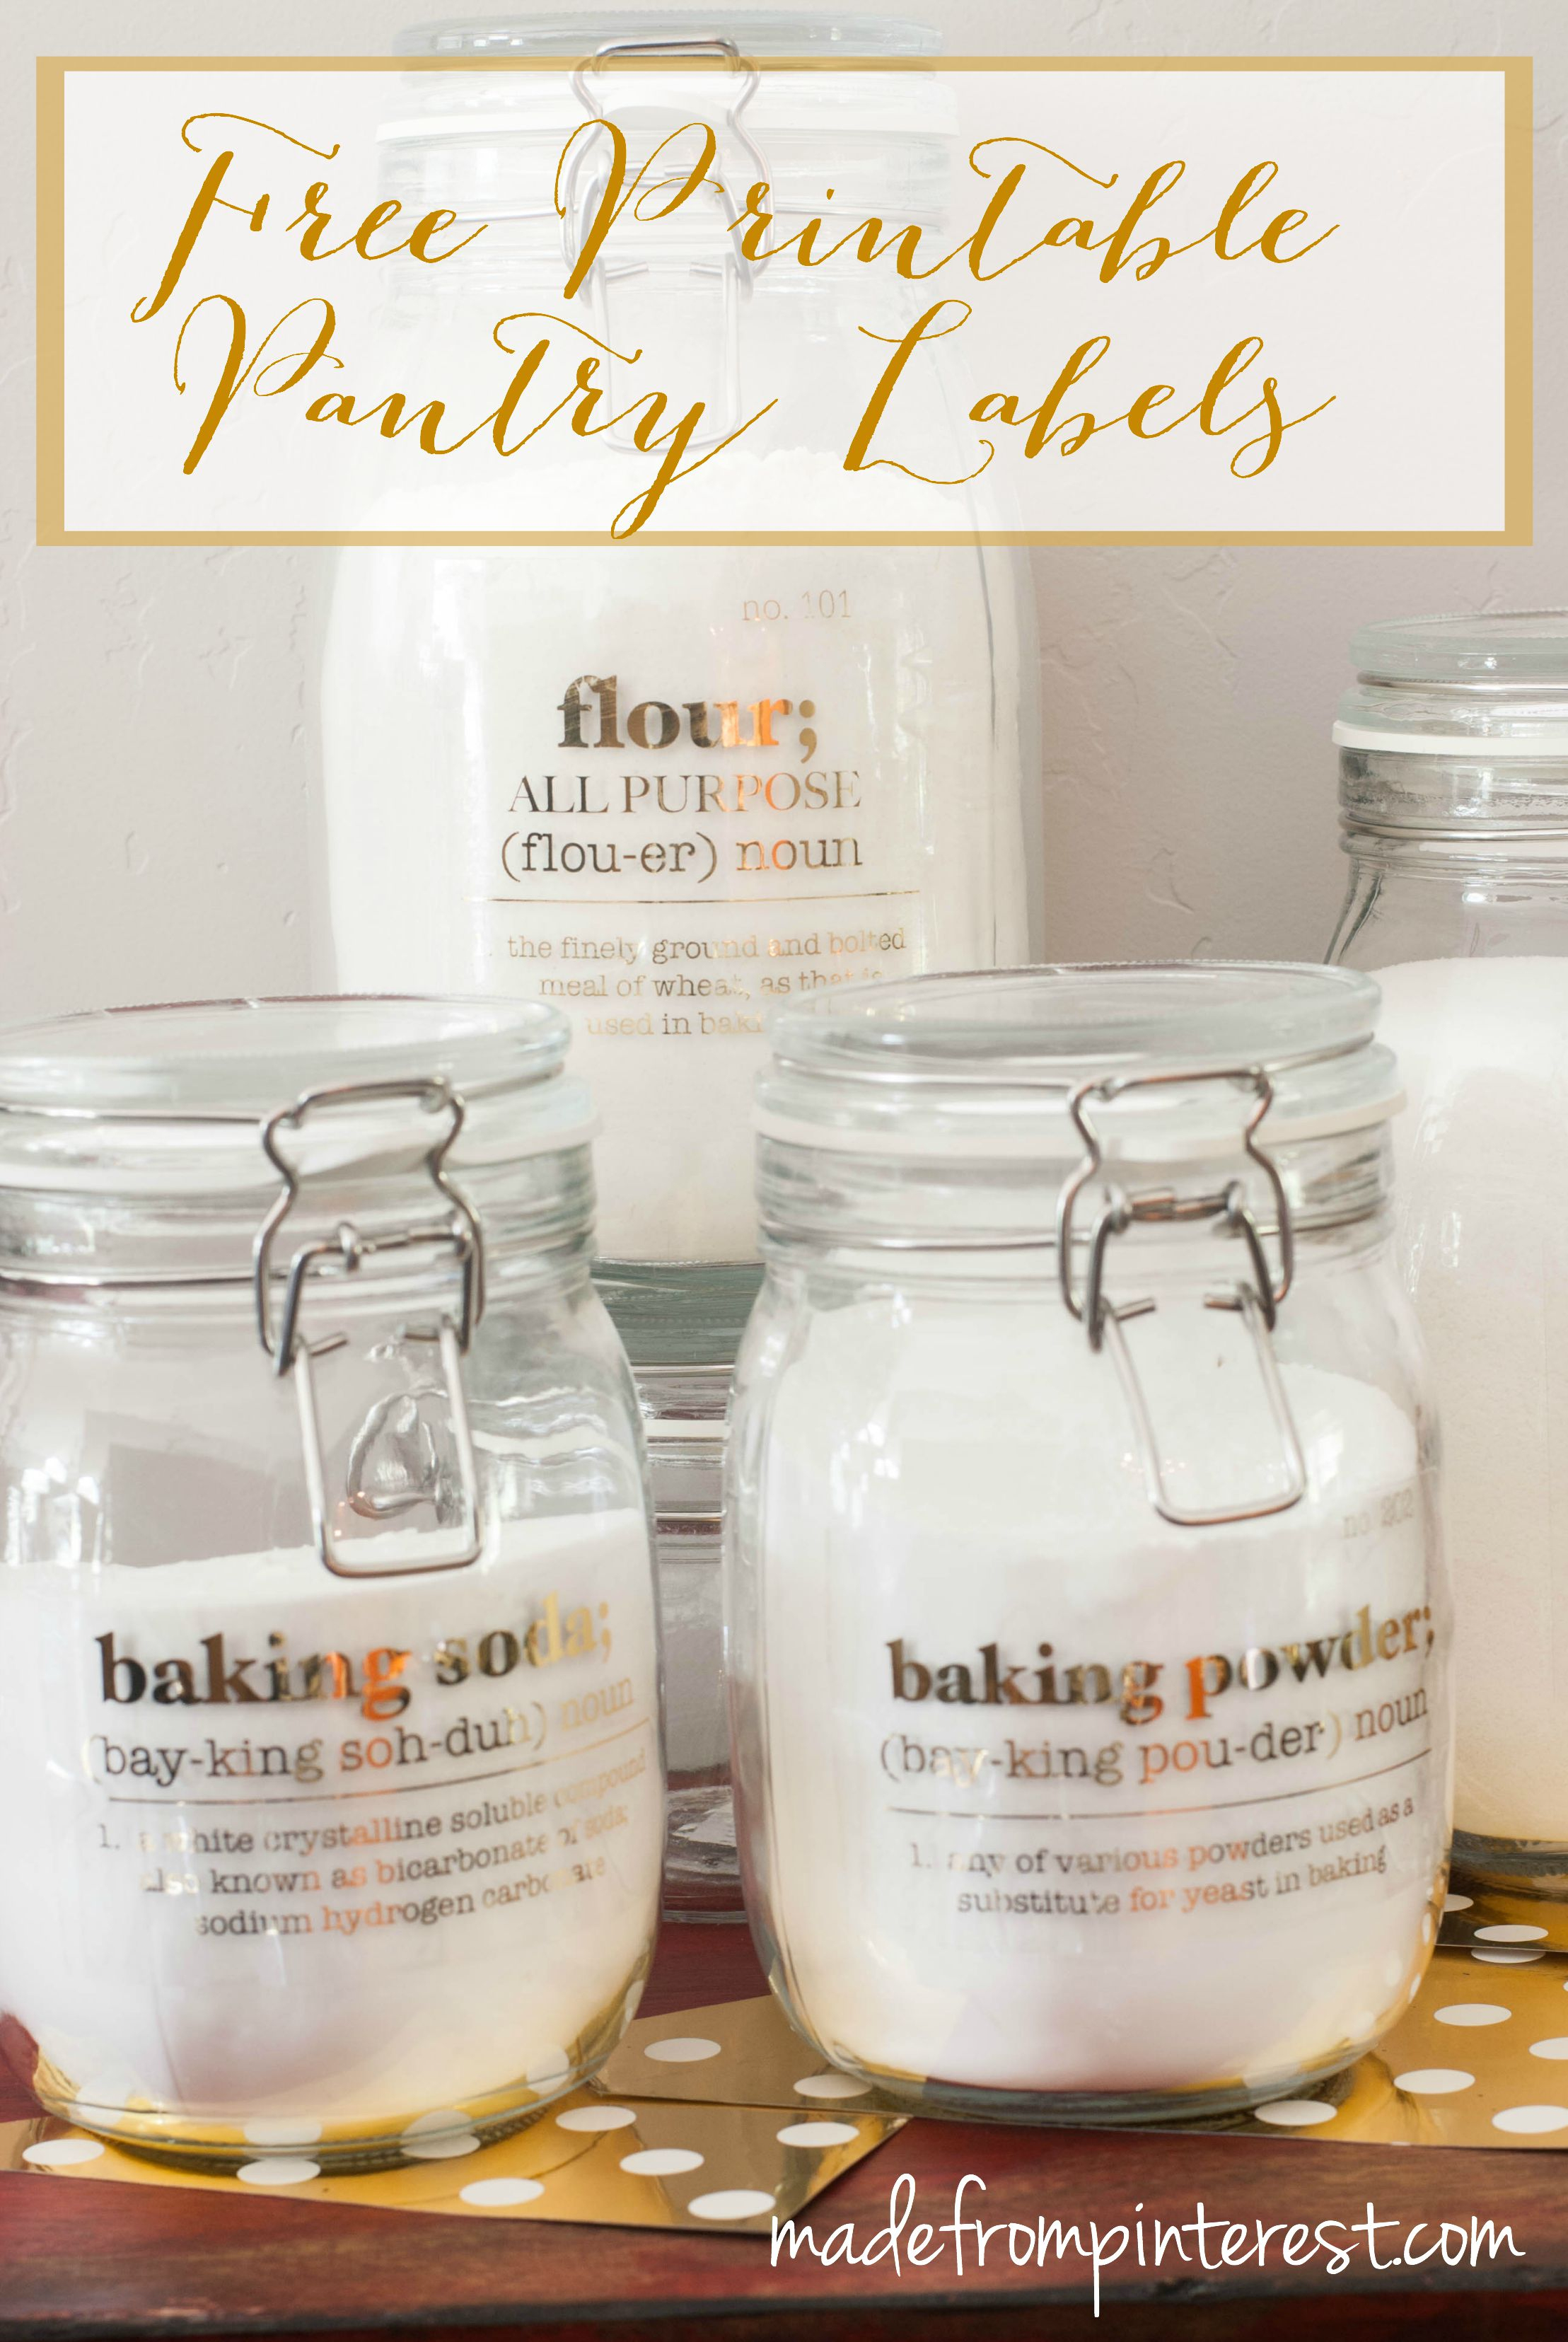 Free Printable Pantry Labels - Tgif - This Grandma Is Fun - Free Printable Pantry Labels